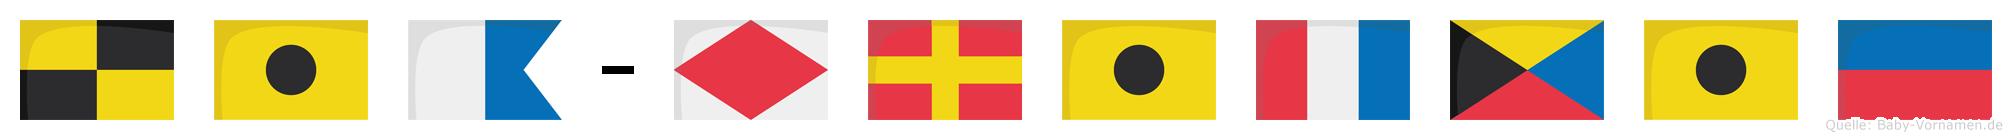 Lia-Fritzie im Flaggenalphabet